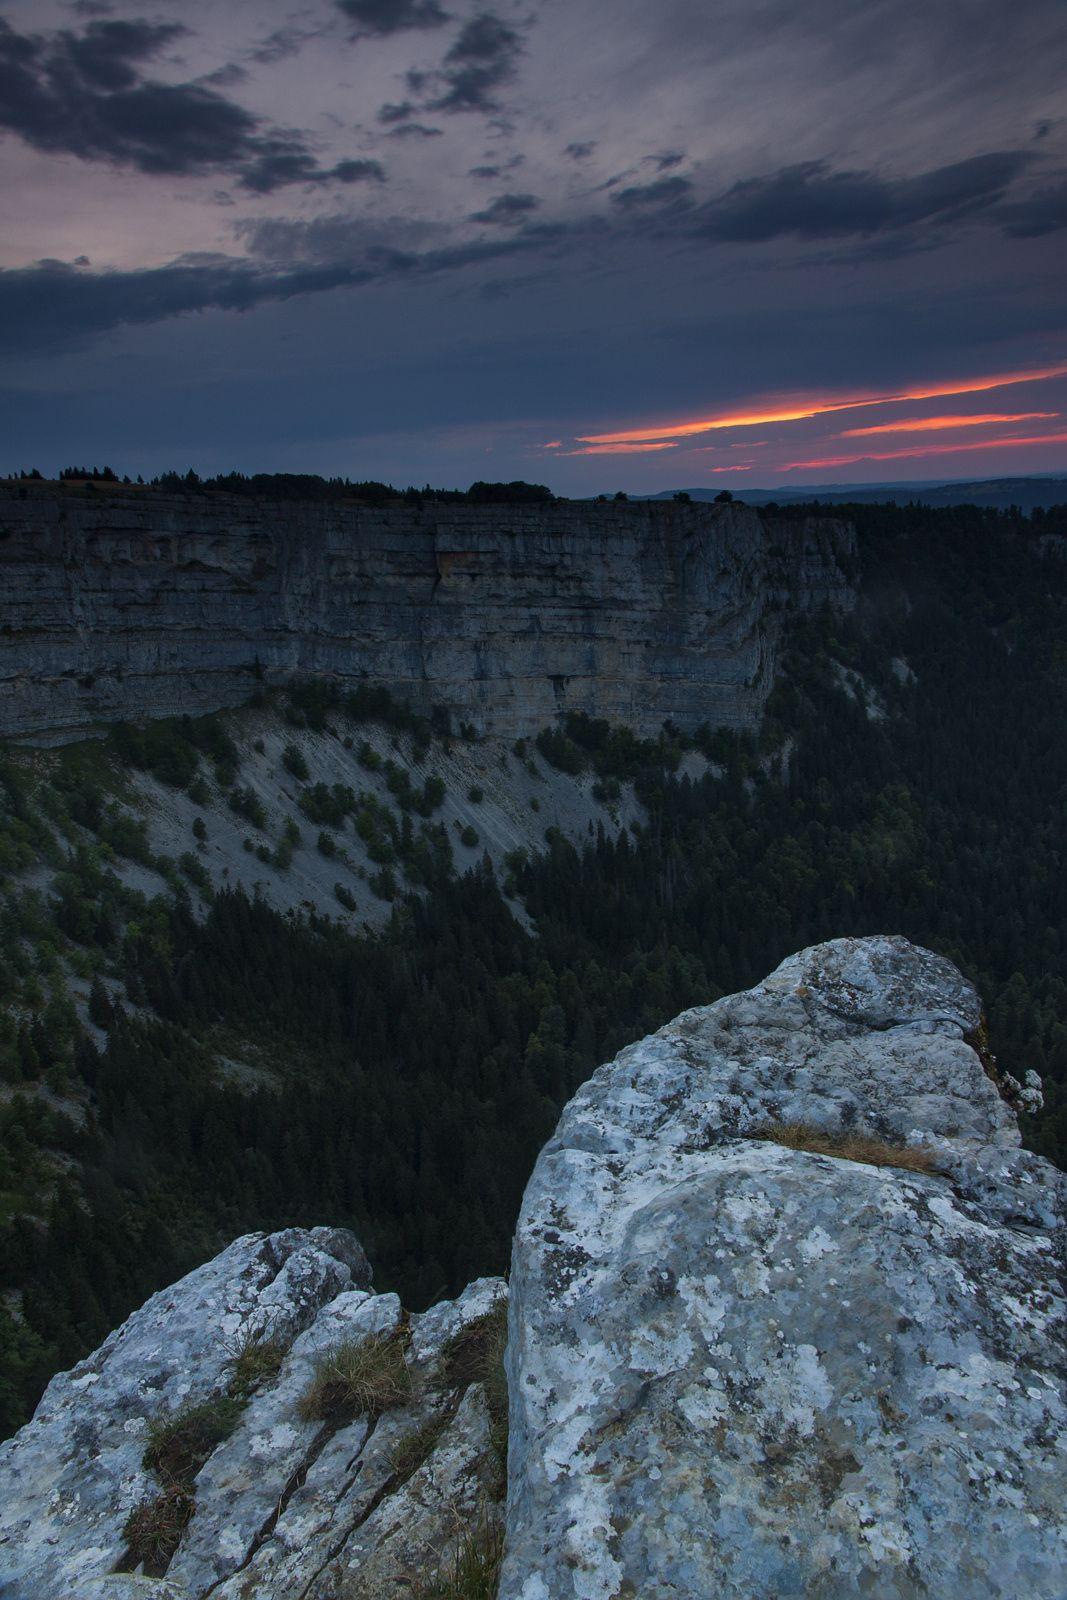 Last light by Thomas Mulchi on 500px